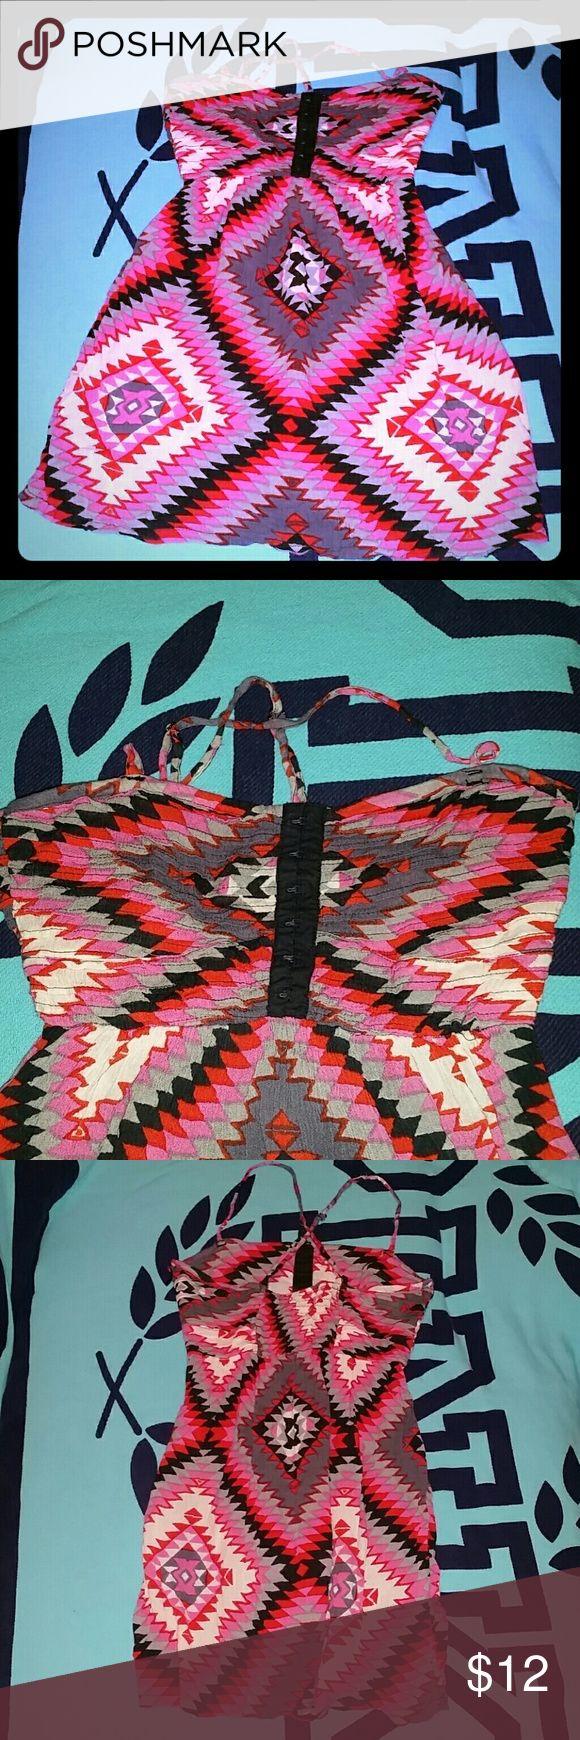 BILLABONG Aztec zip up dress Bright and vibrant color scheme. Criss cross adjustable straps. Zip up left side. Inner black lining. Billabong Dresses Mini